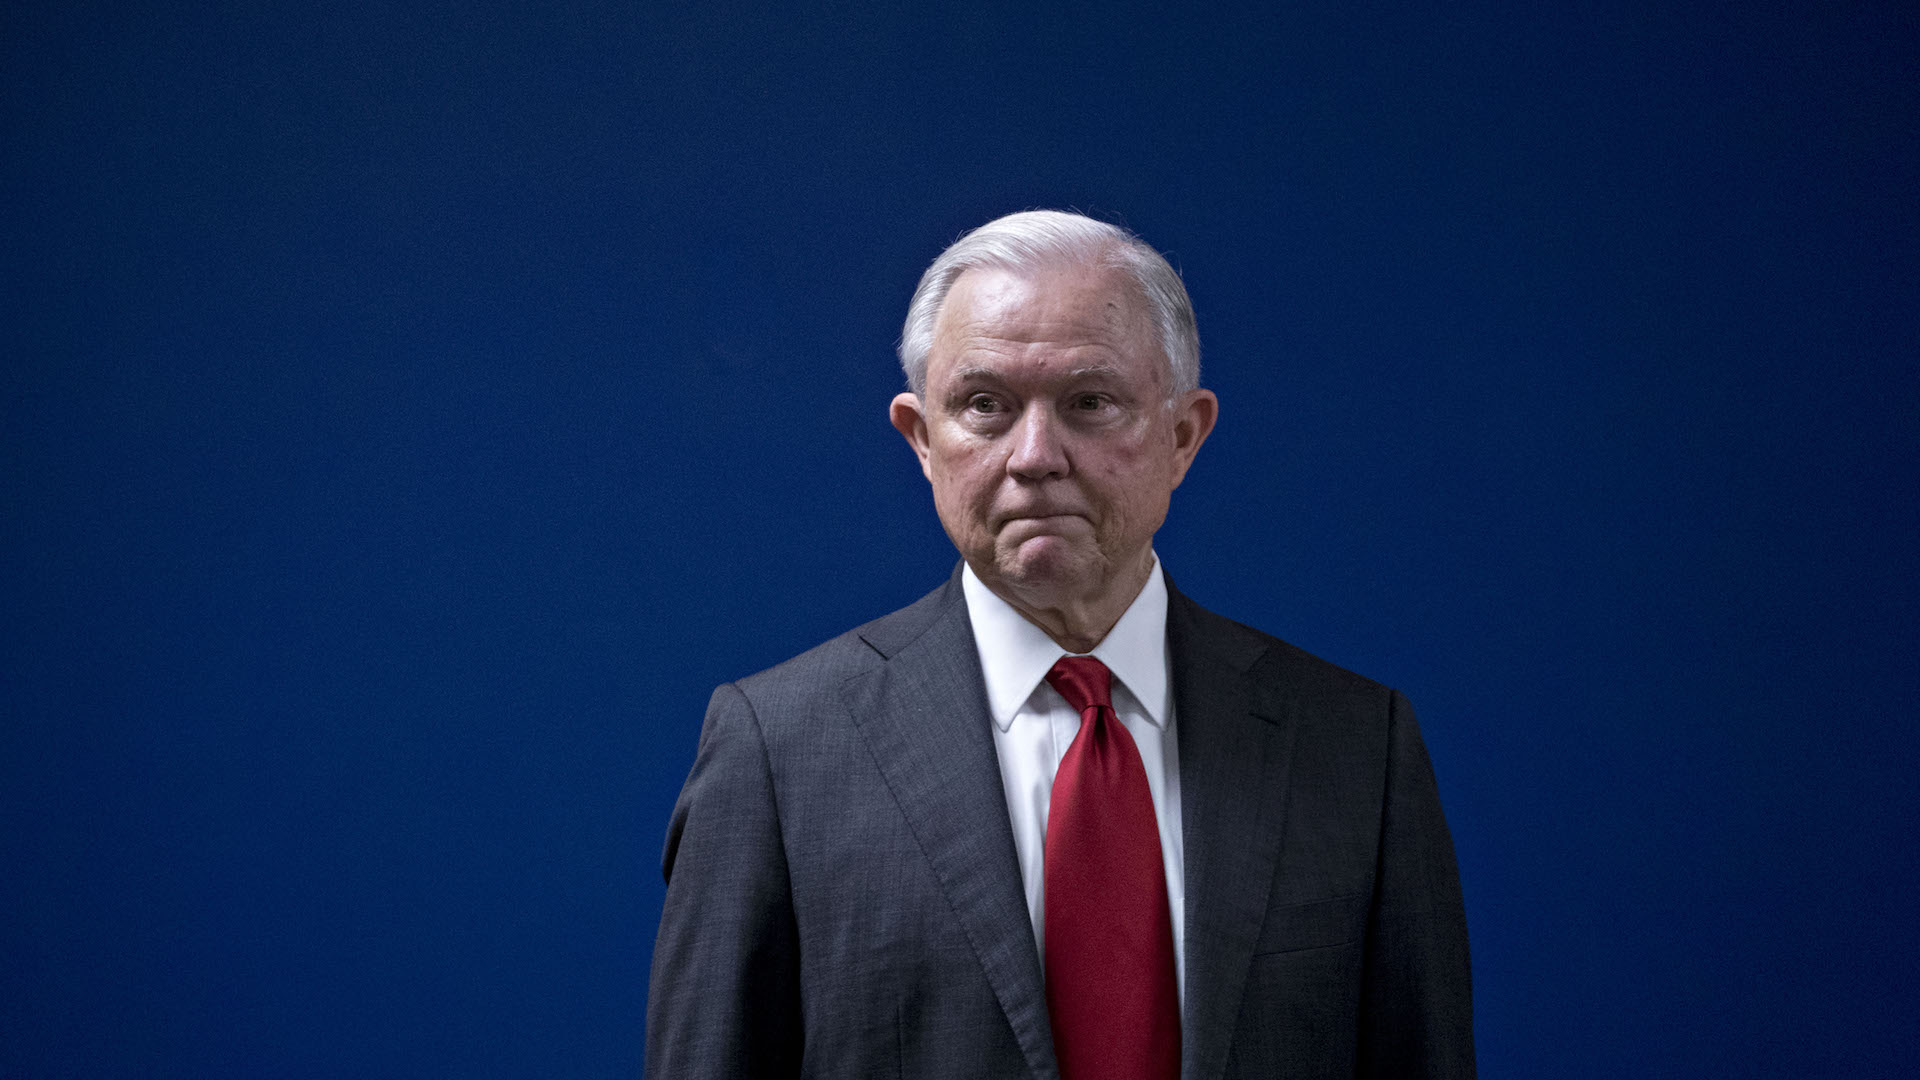 Jeff Sessions attacks judges thwarting Trump agenda, blasts order for Wilbur Ross deposition